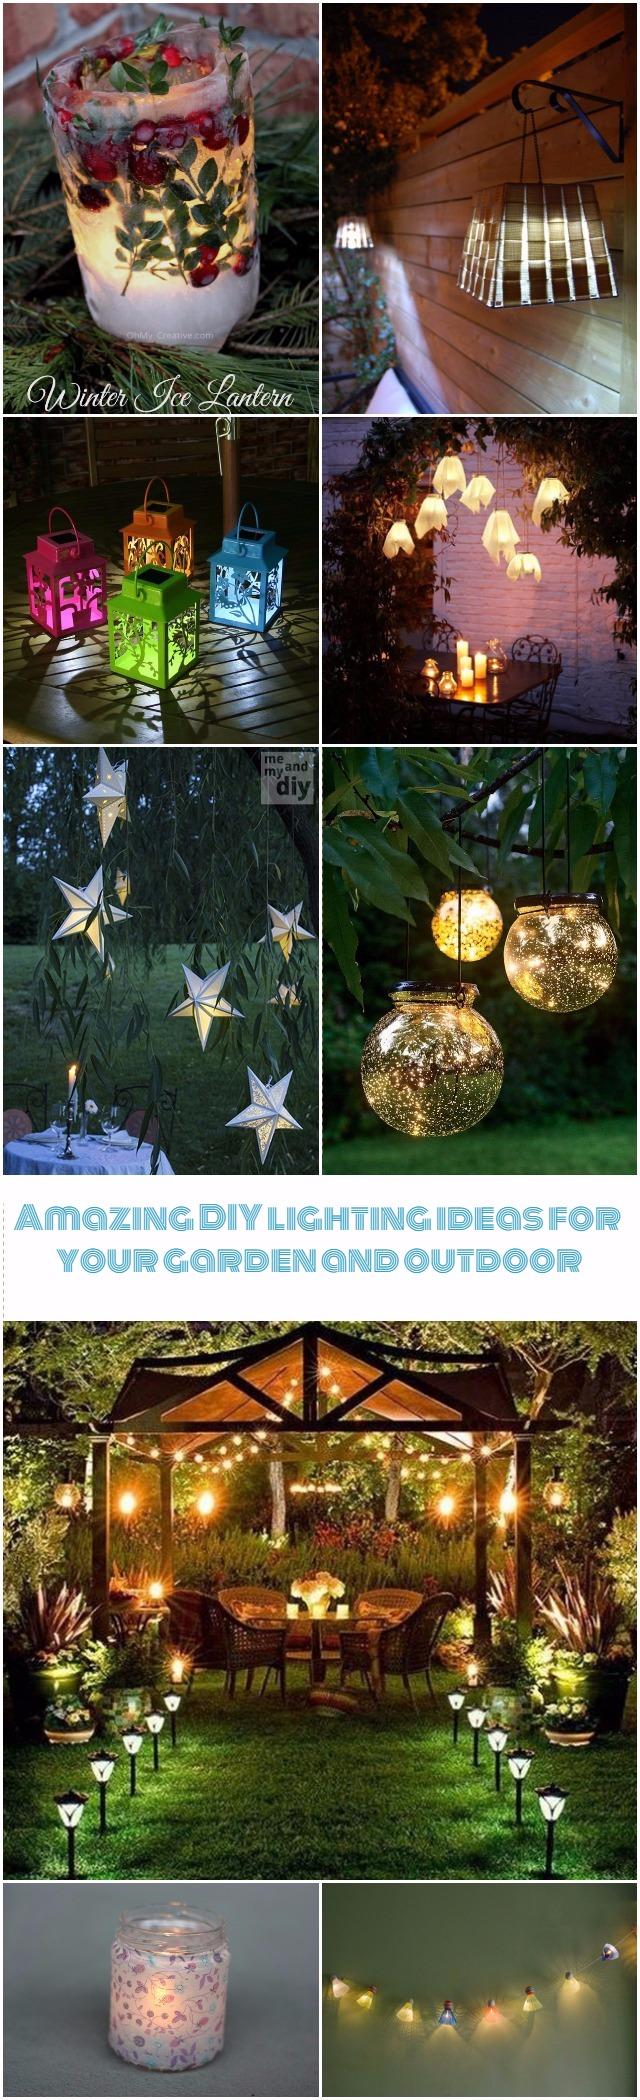 diy lighting | diy lighting ideas | diy lighting fixtures